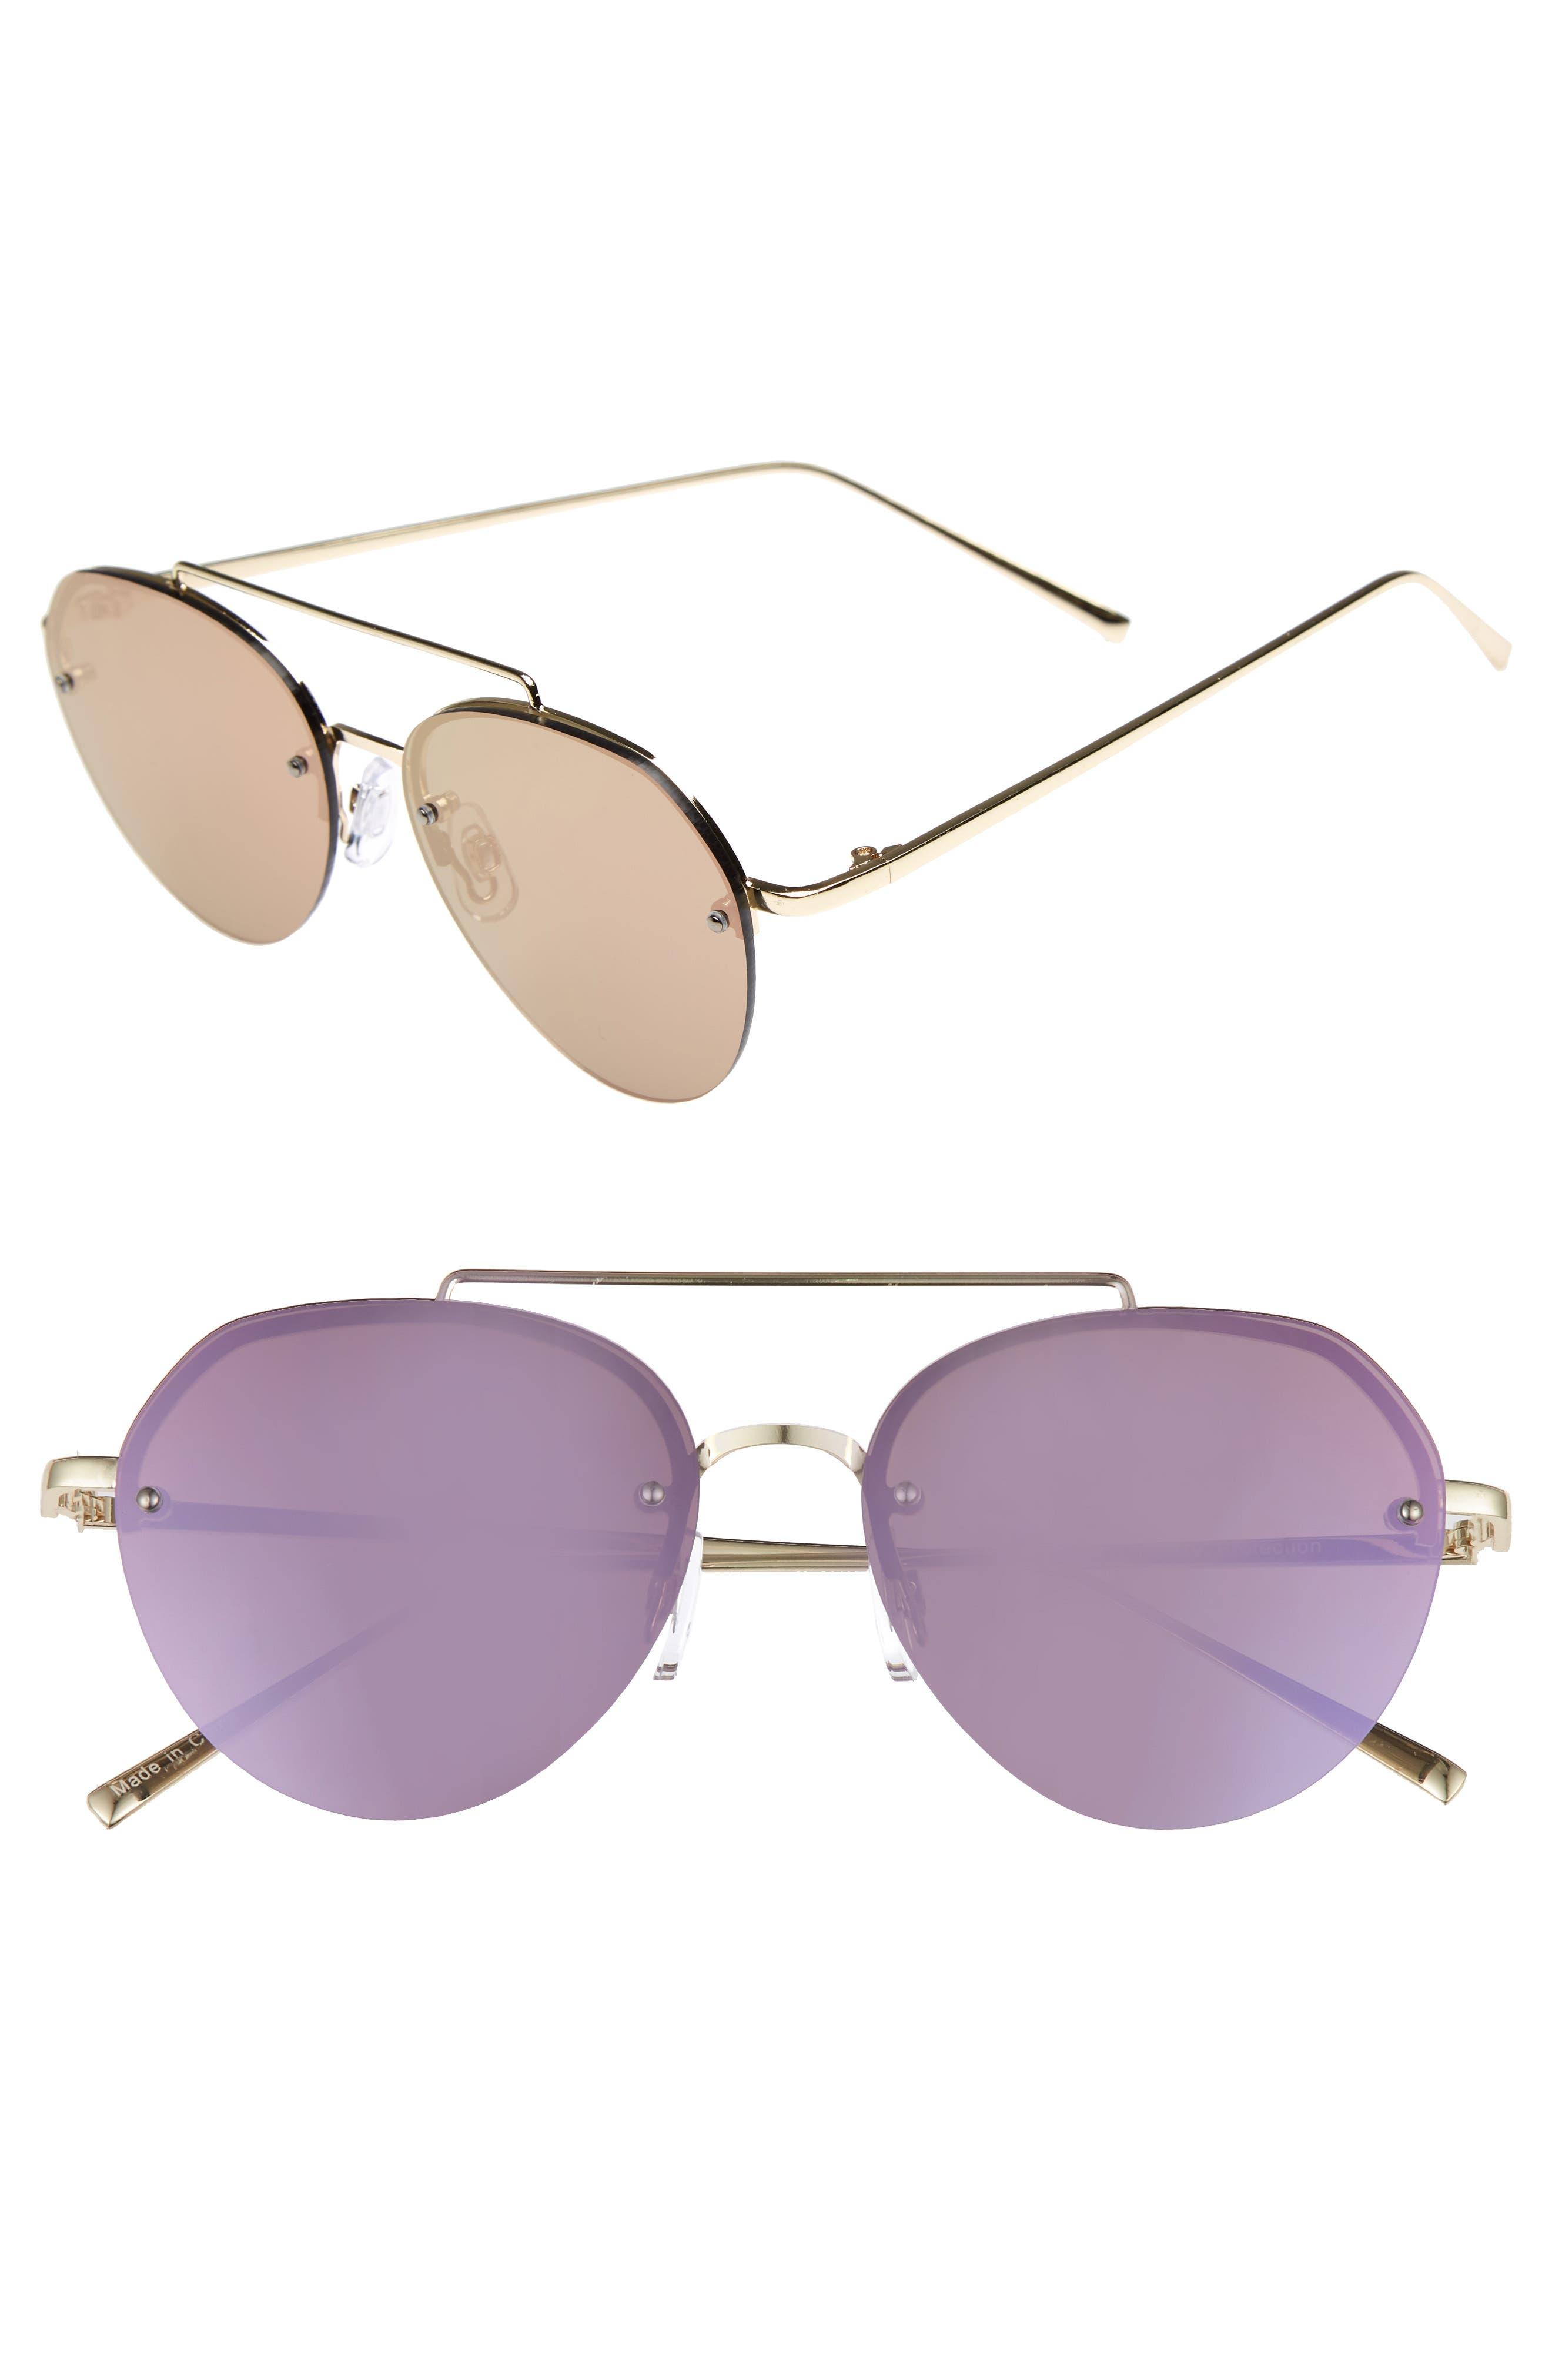 Gradient Petite Aviator Sunglasses,                             Main thumbnail 1, color,                             Lavender